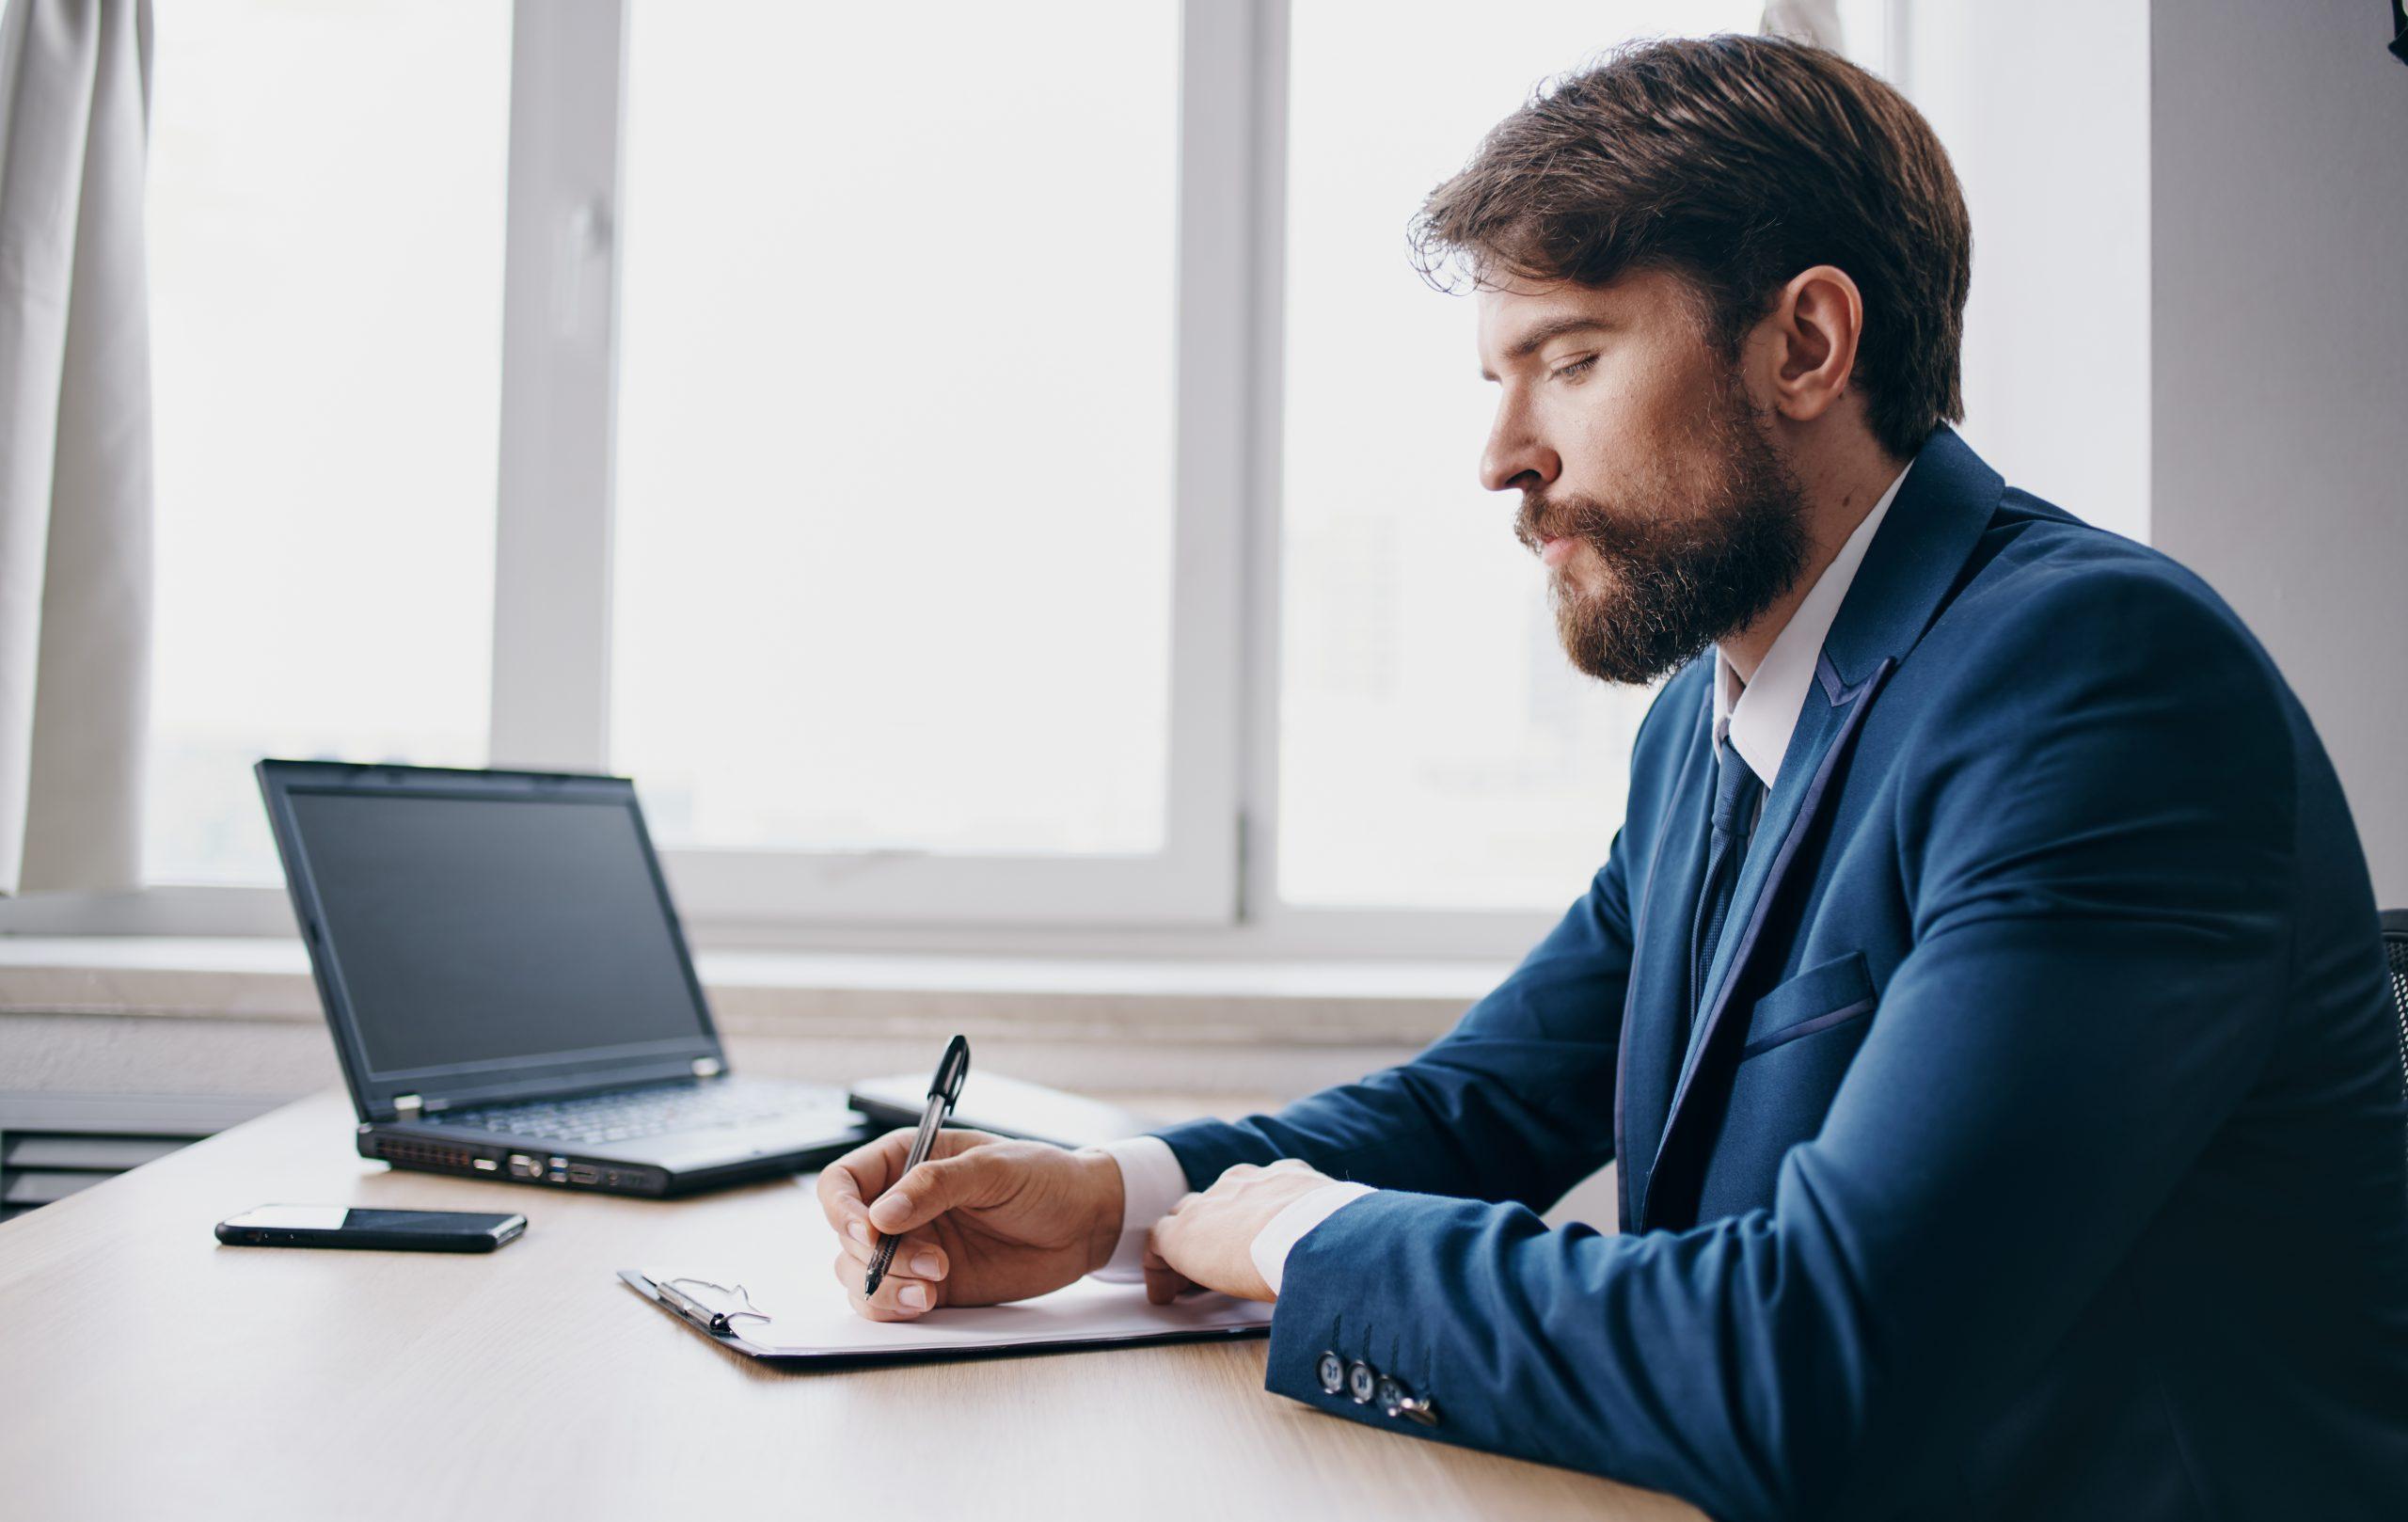 Benefits of Windows scripting